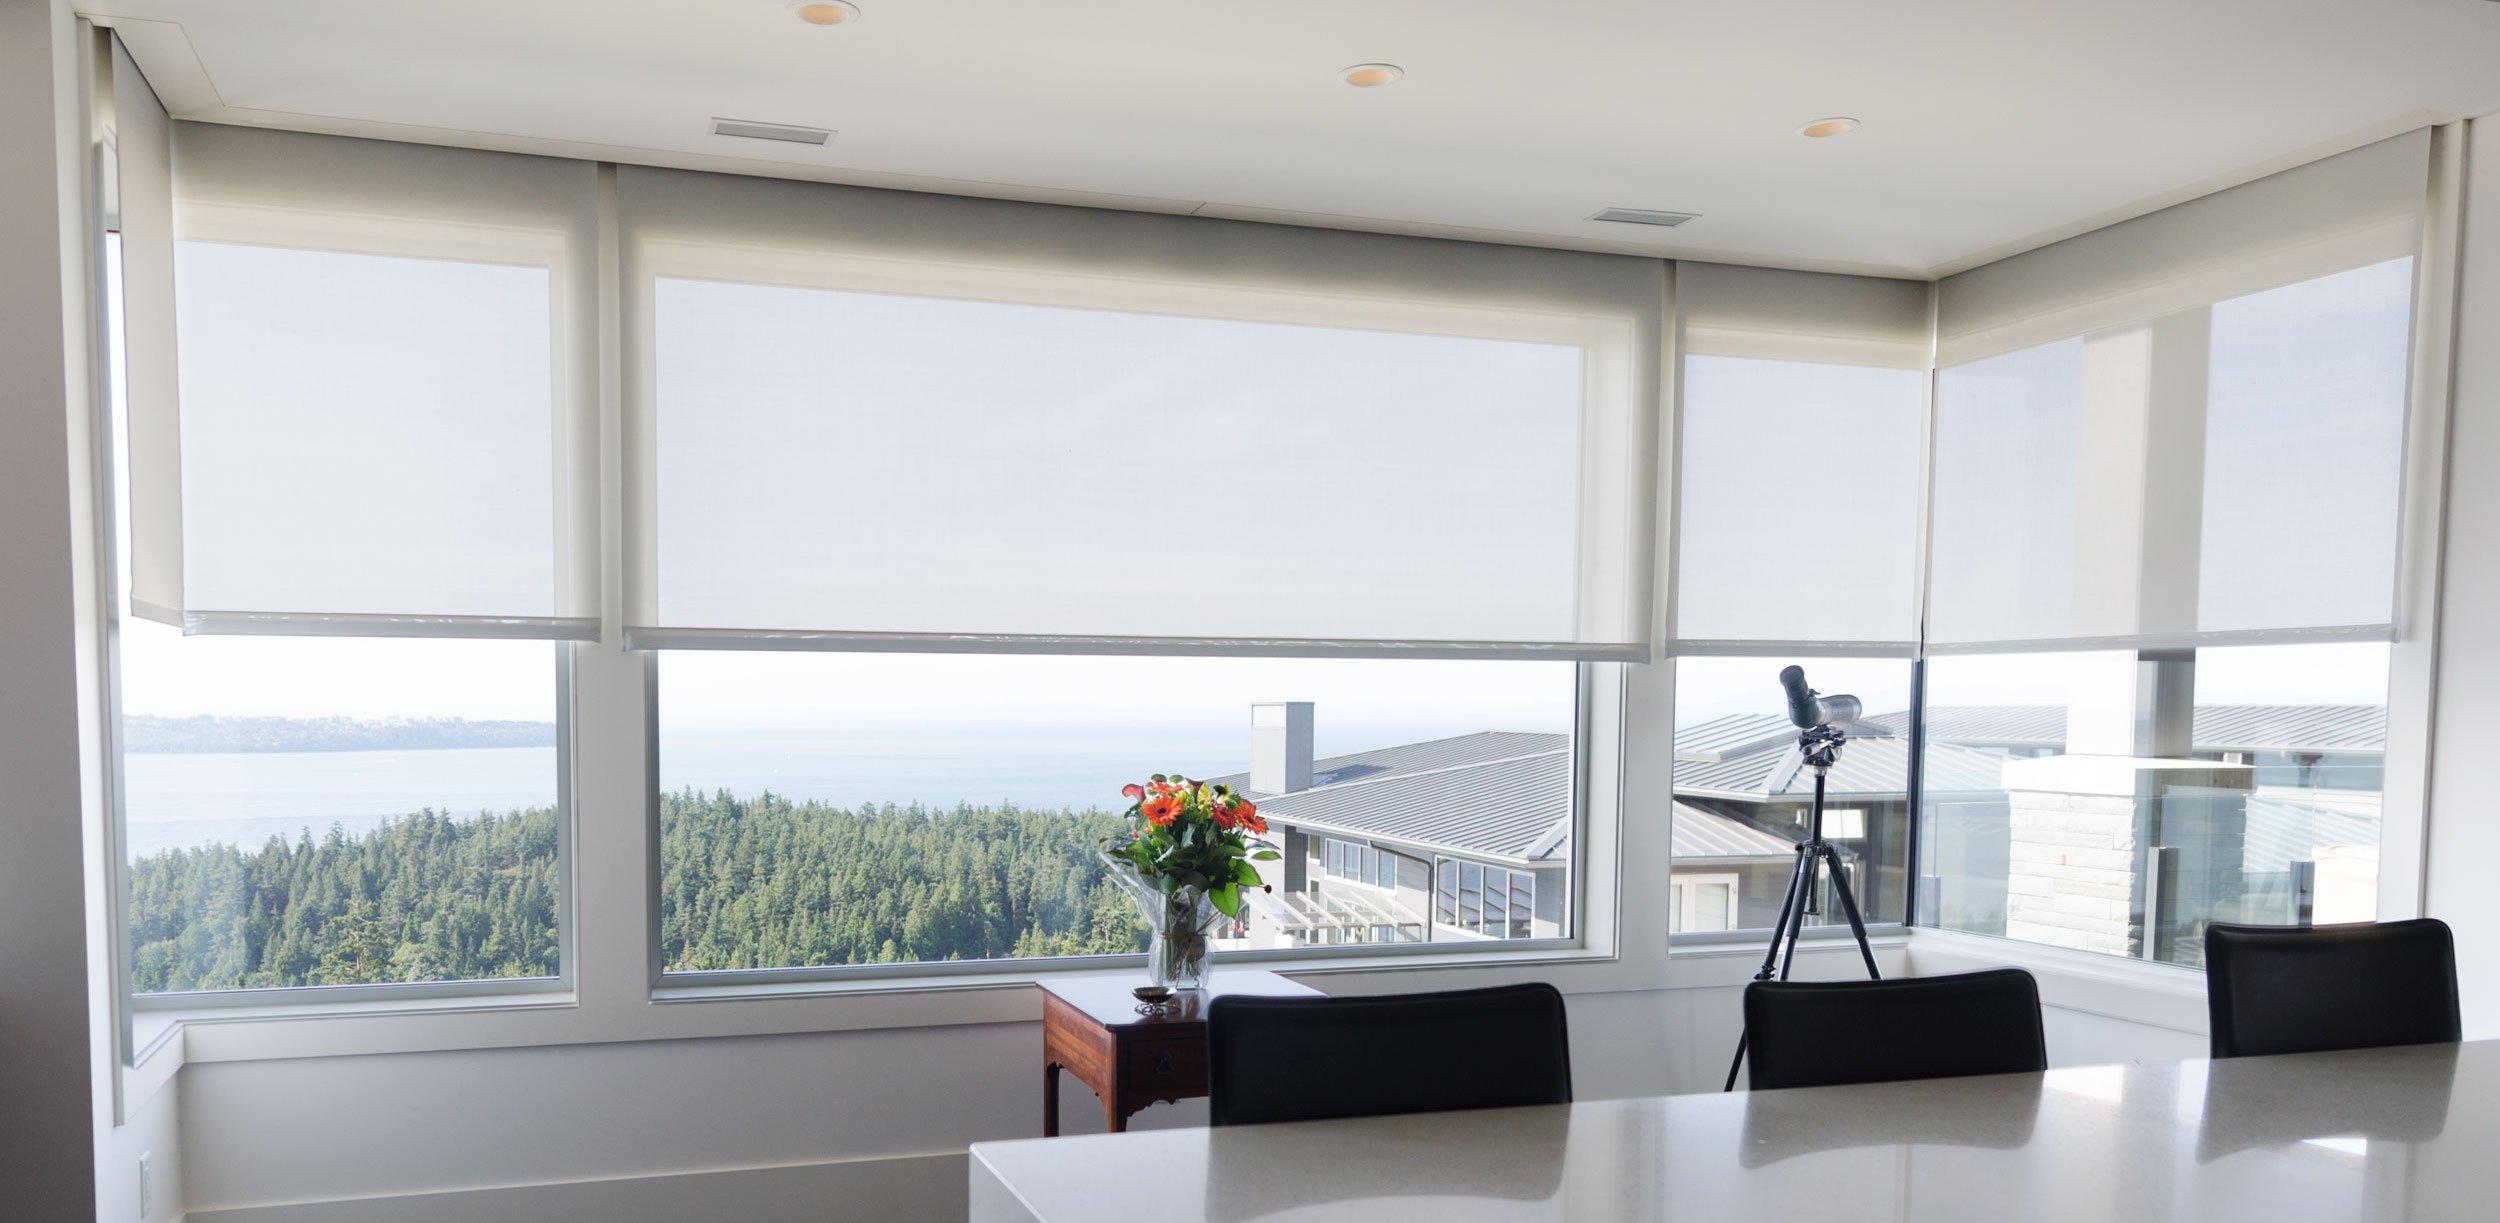 motorized blinds electric motorized shades and blinds | nyc long island u0026 brooklyn SDNUKQE